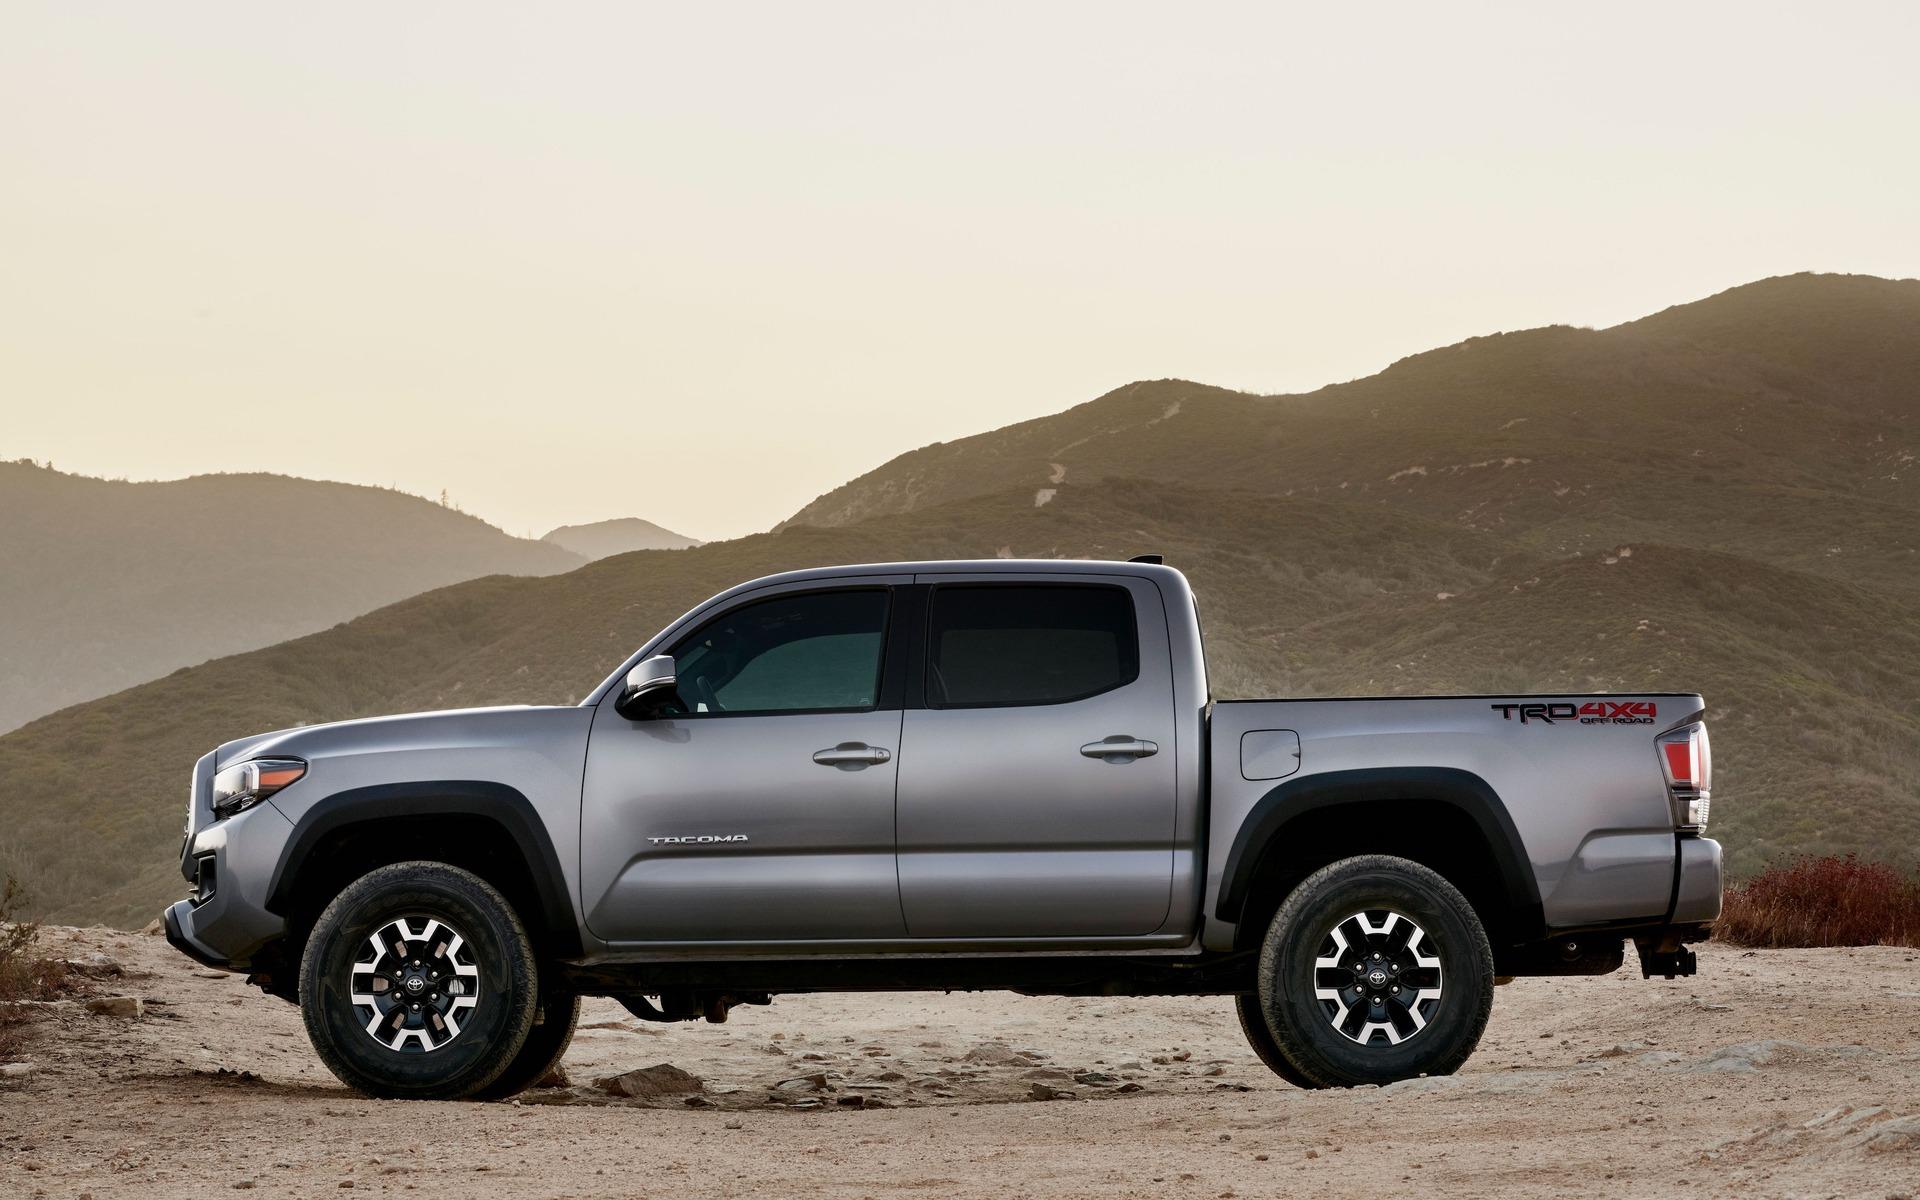 Le Toyota Tacoma 2020 introduit au Salon de l'auto de Chicago 366352_2020_Toyota_Tacoma